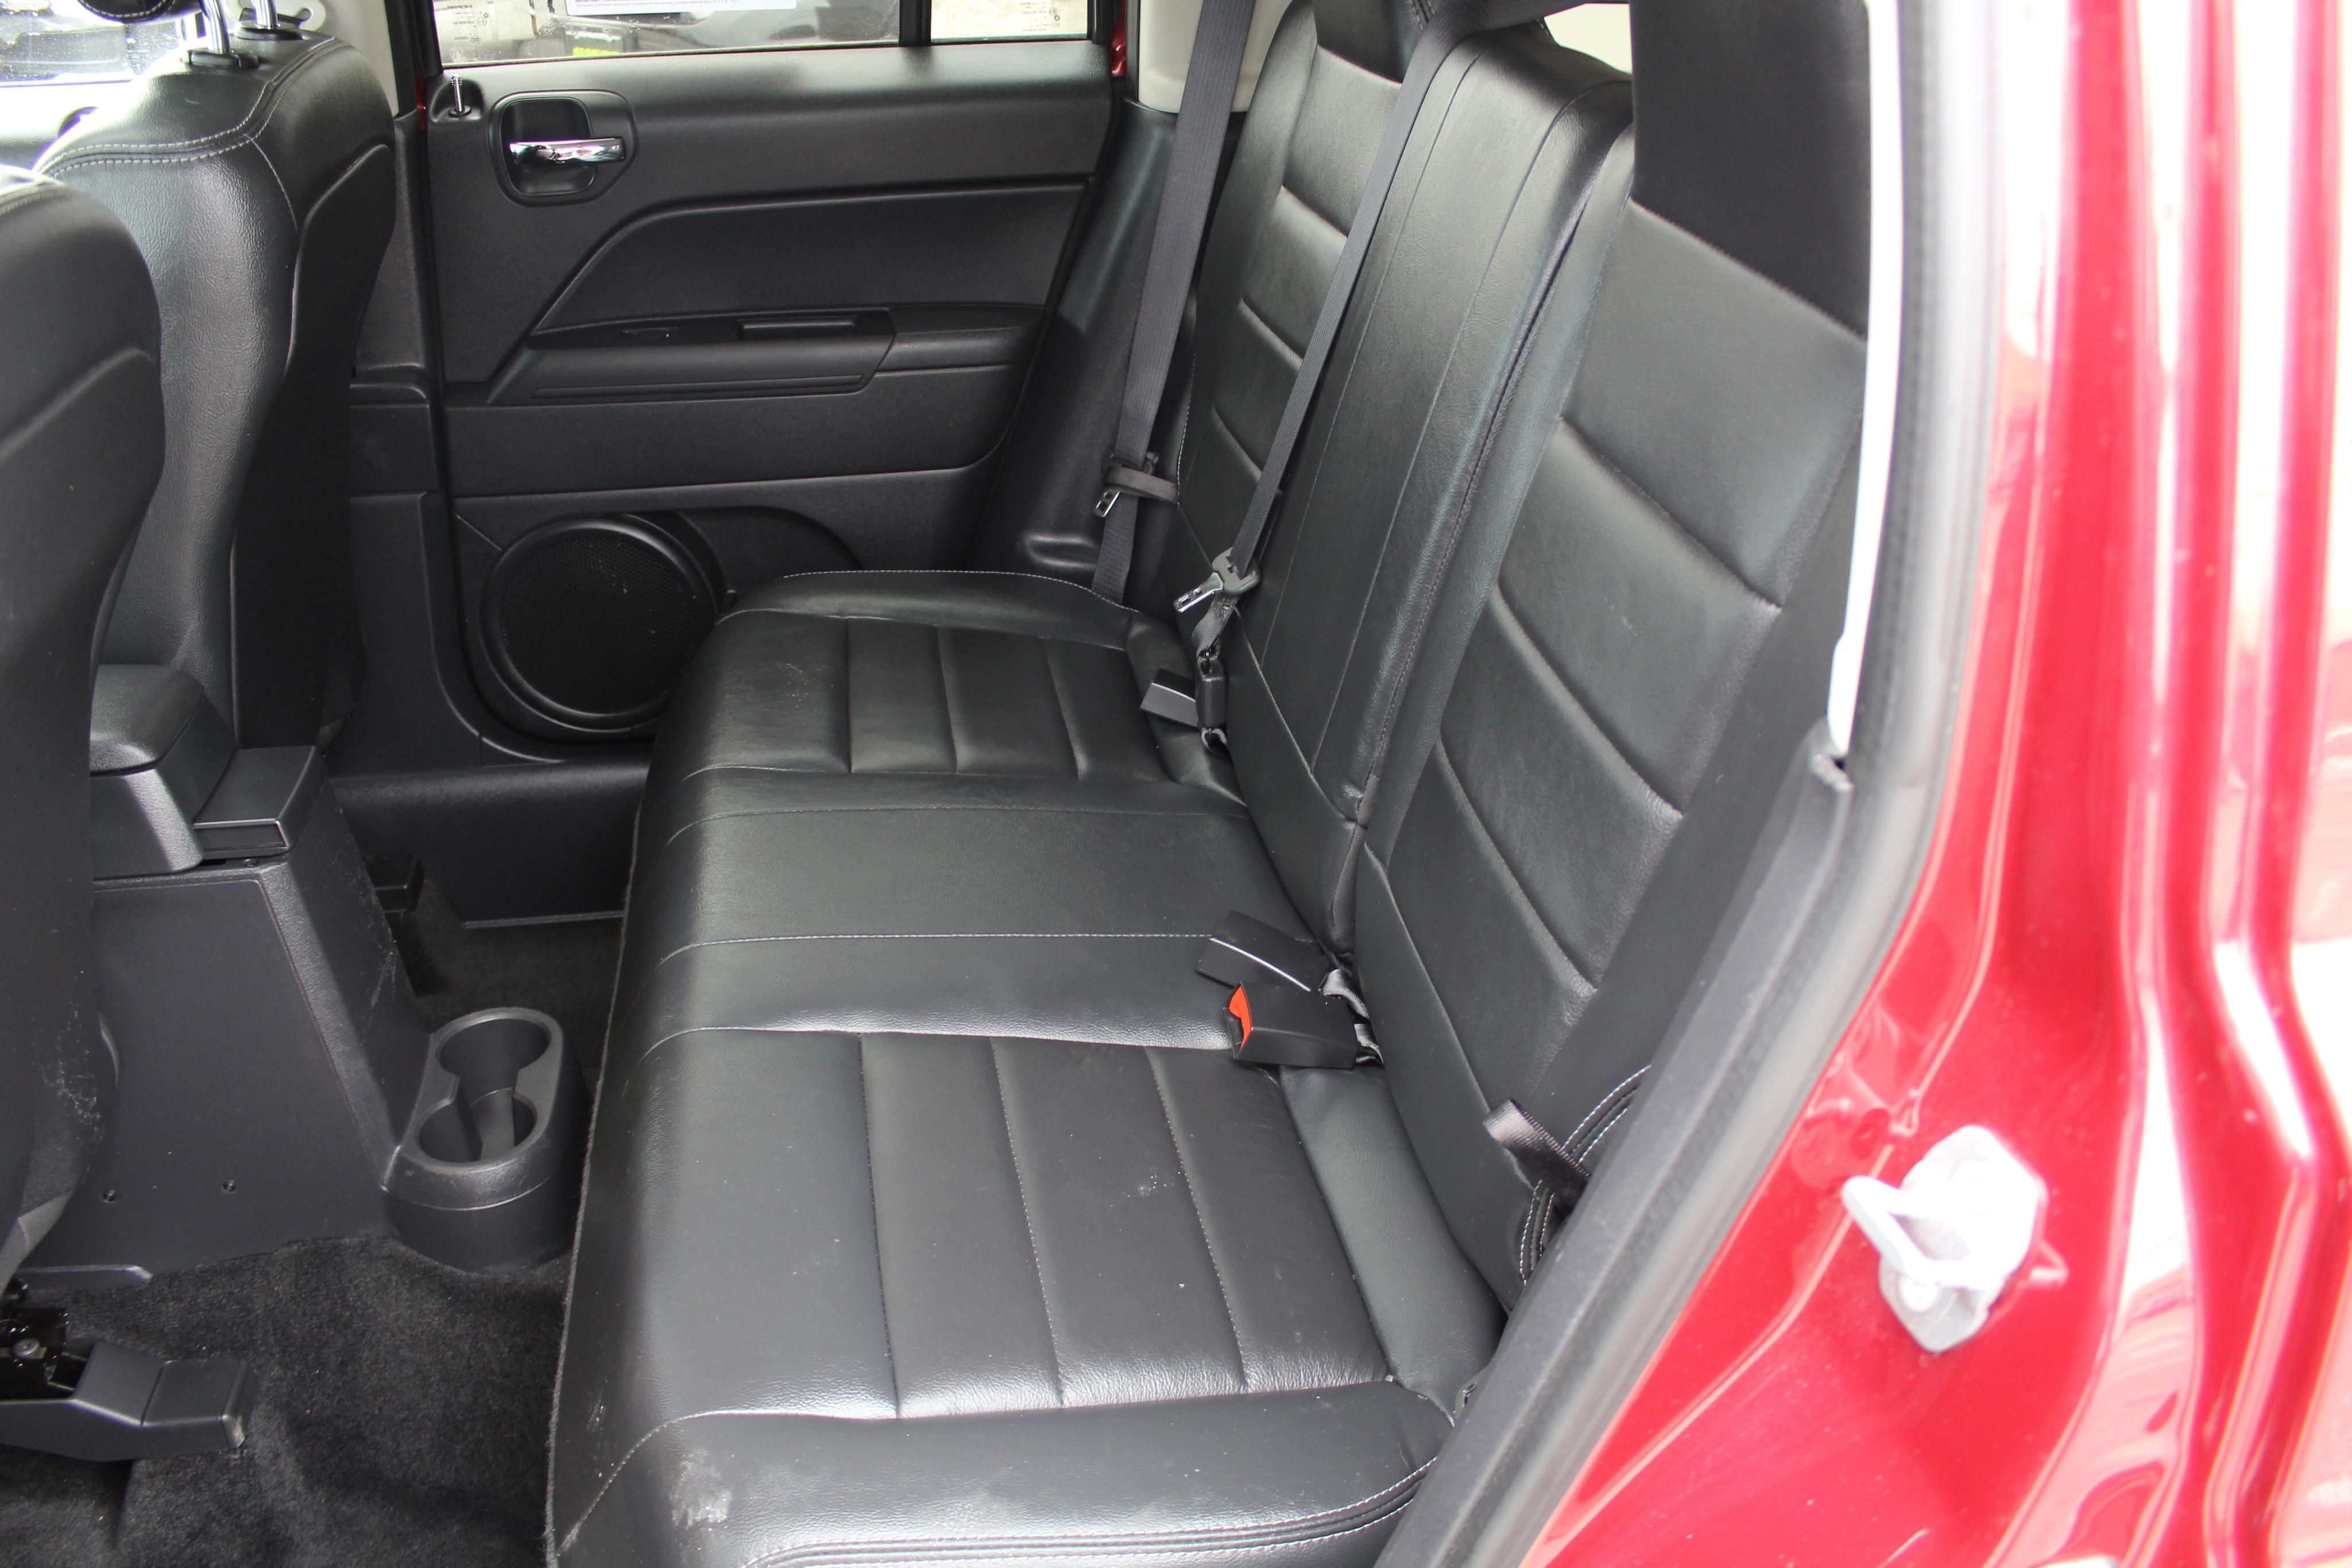 2016 Jeep Patriot Wagon 4 Dr.